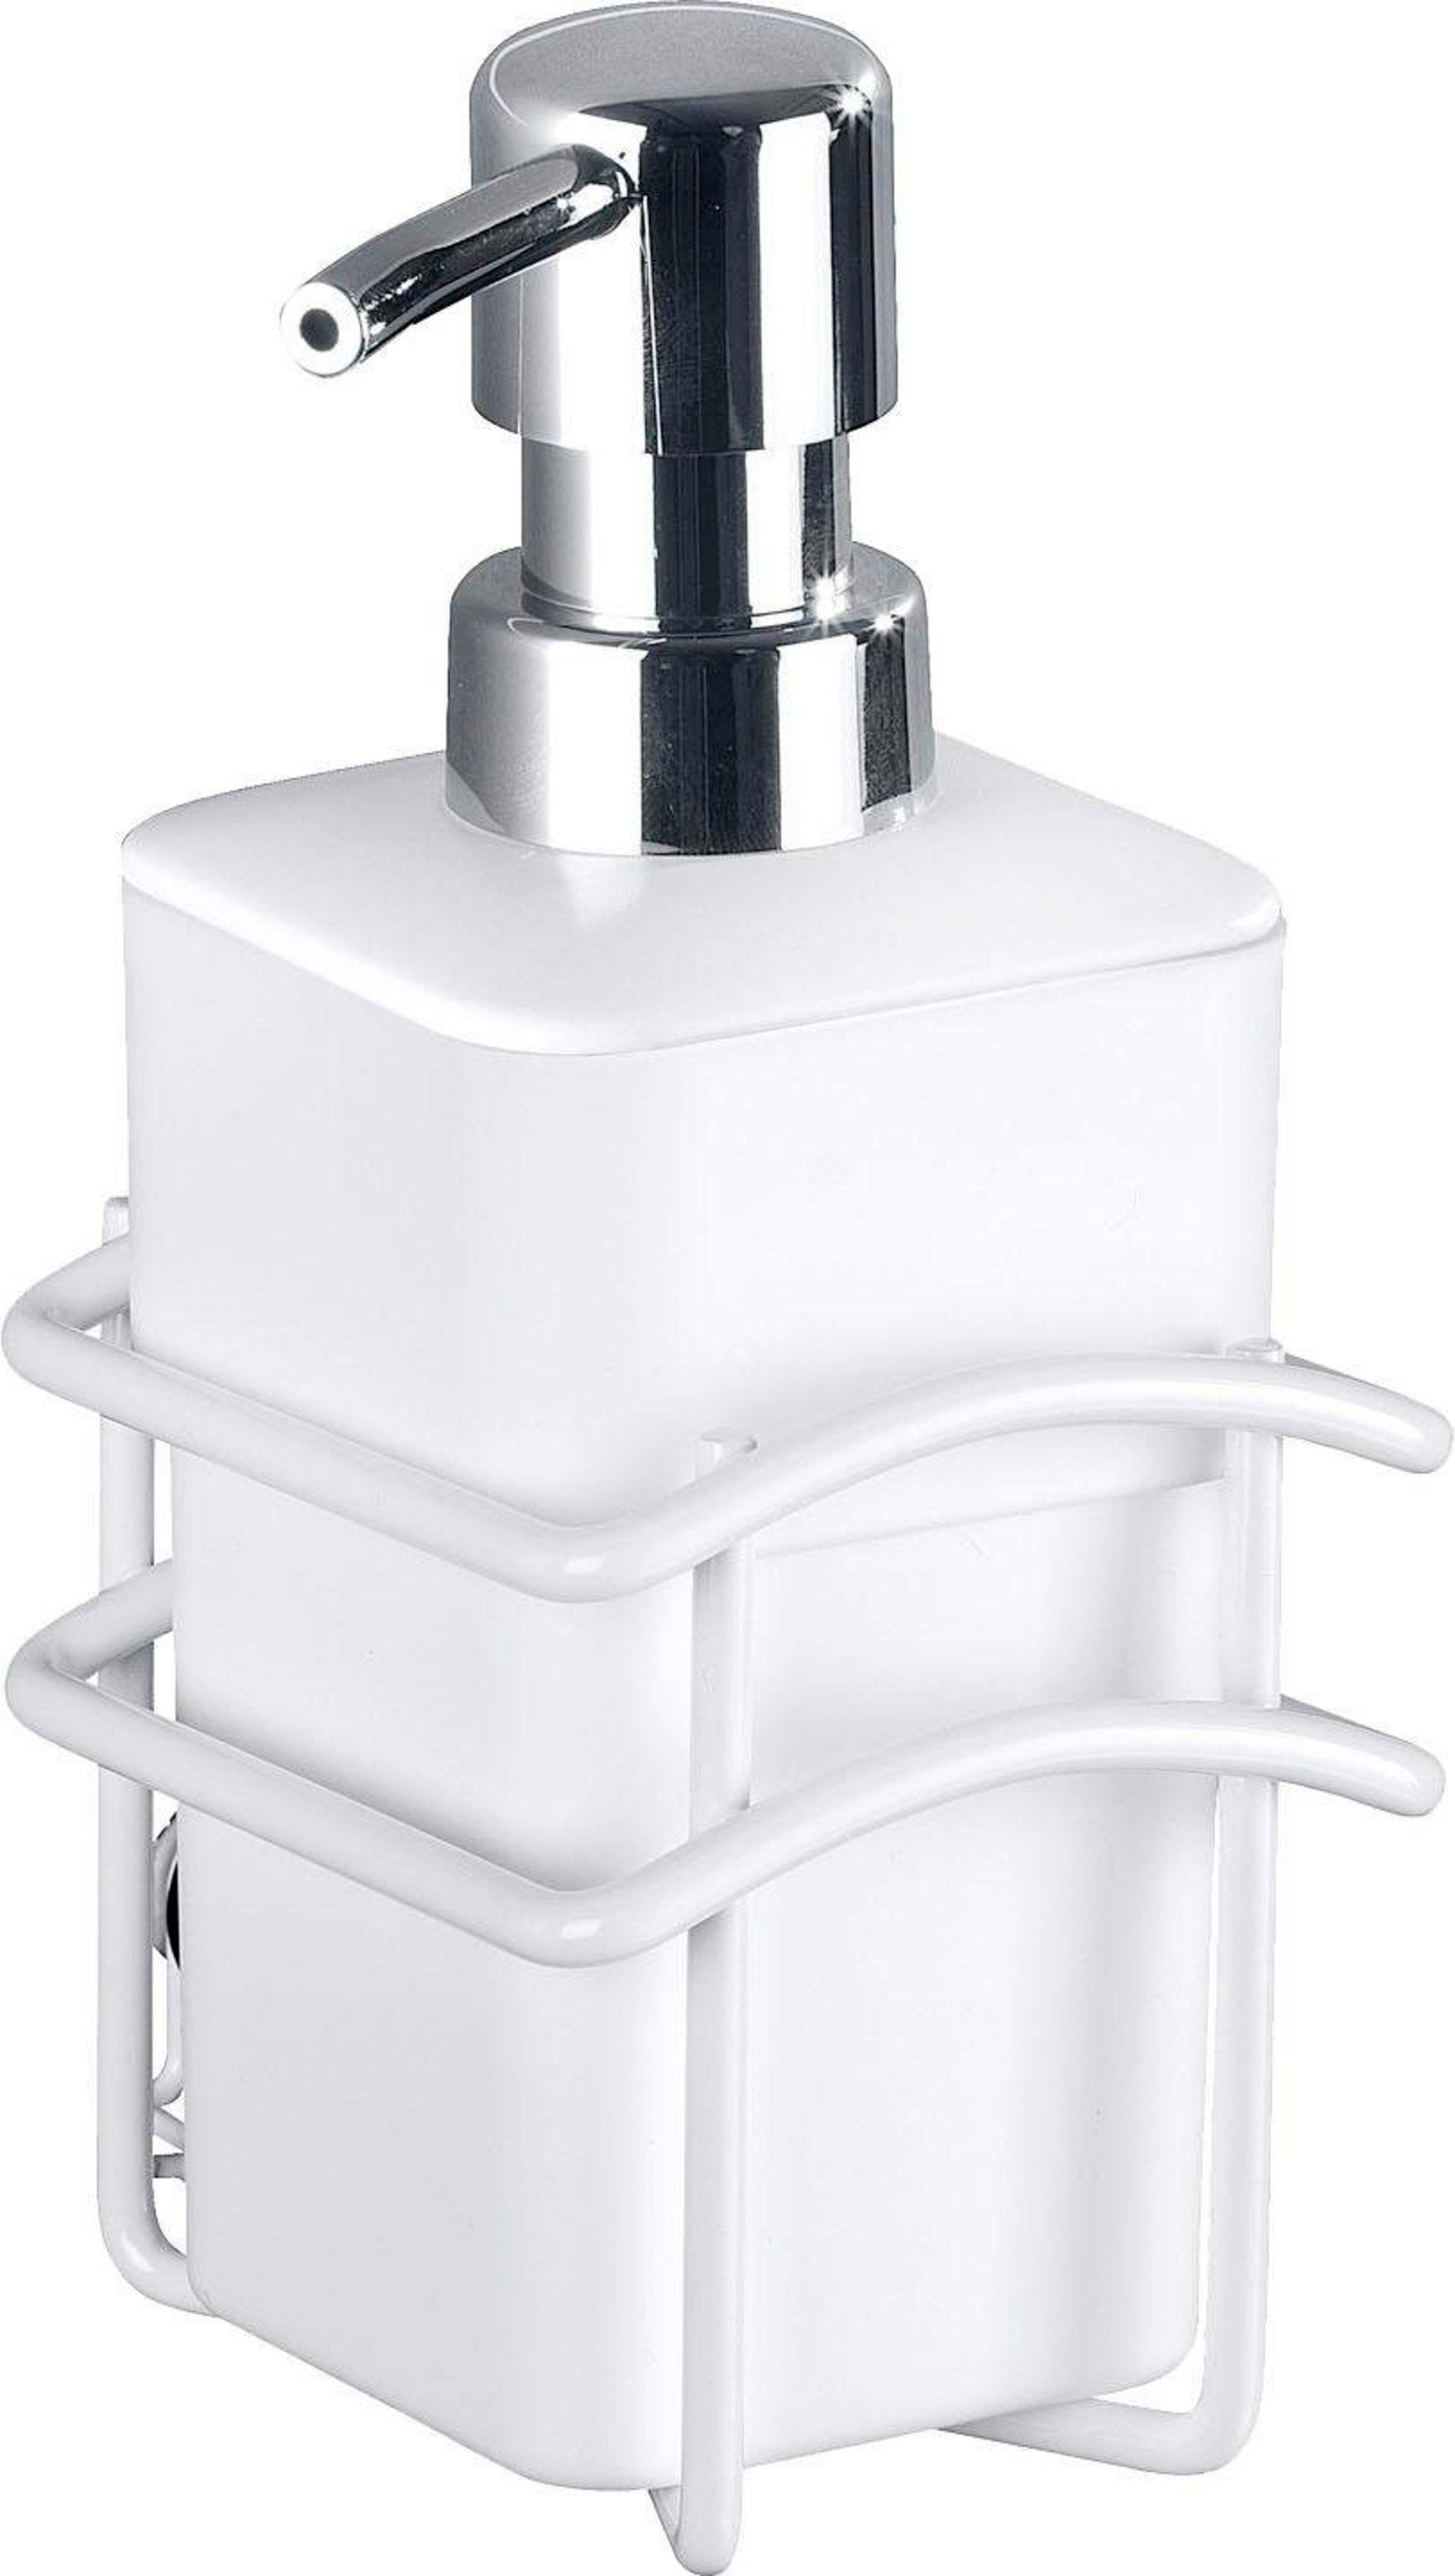 WENKO zeepdispenser Classic Plus - verschillende betaalmethodes